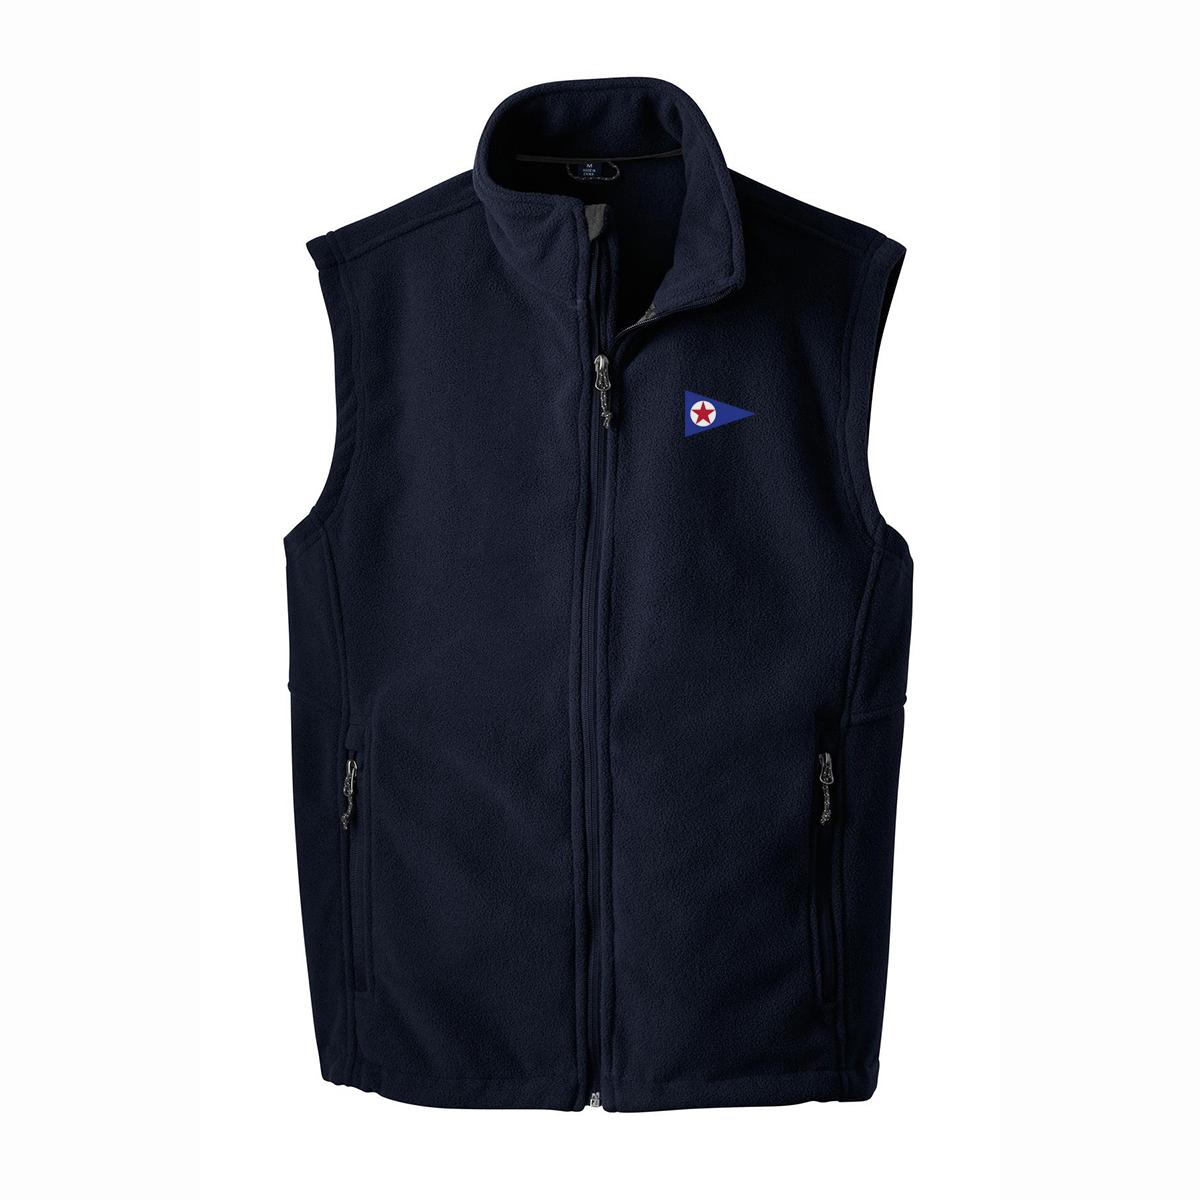 Barnstable Yacht Club - Men's Value Fleece Vest (BNY403)